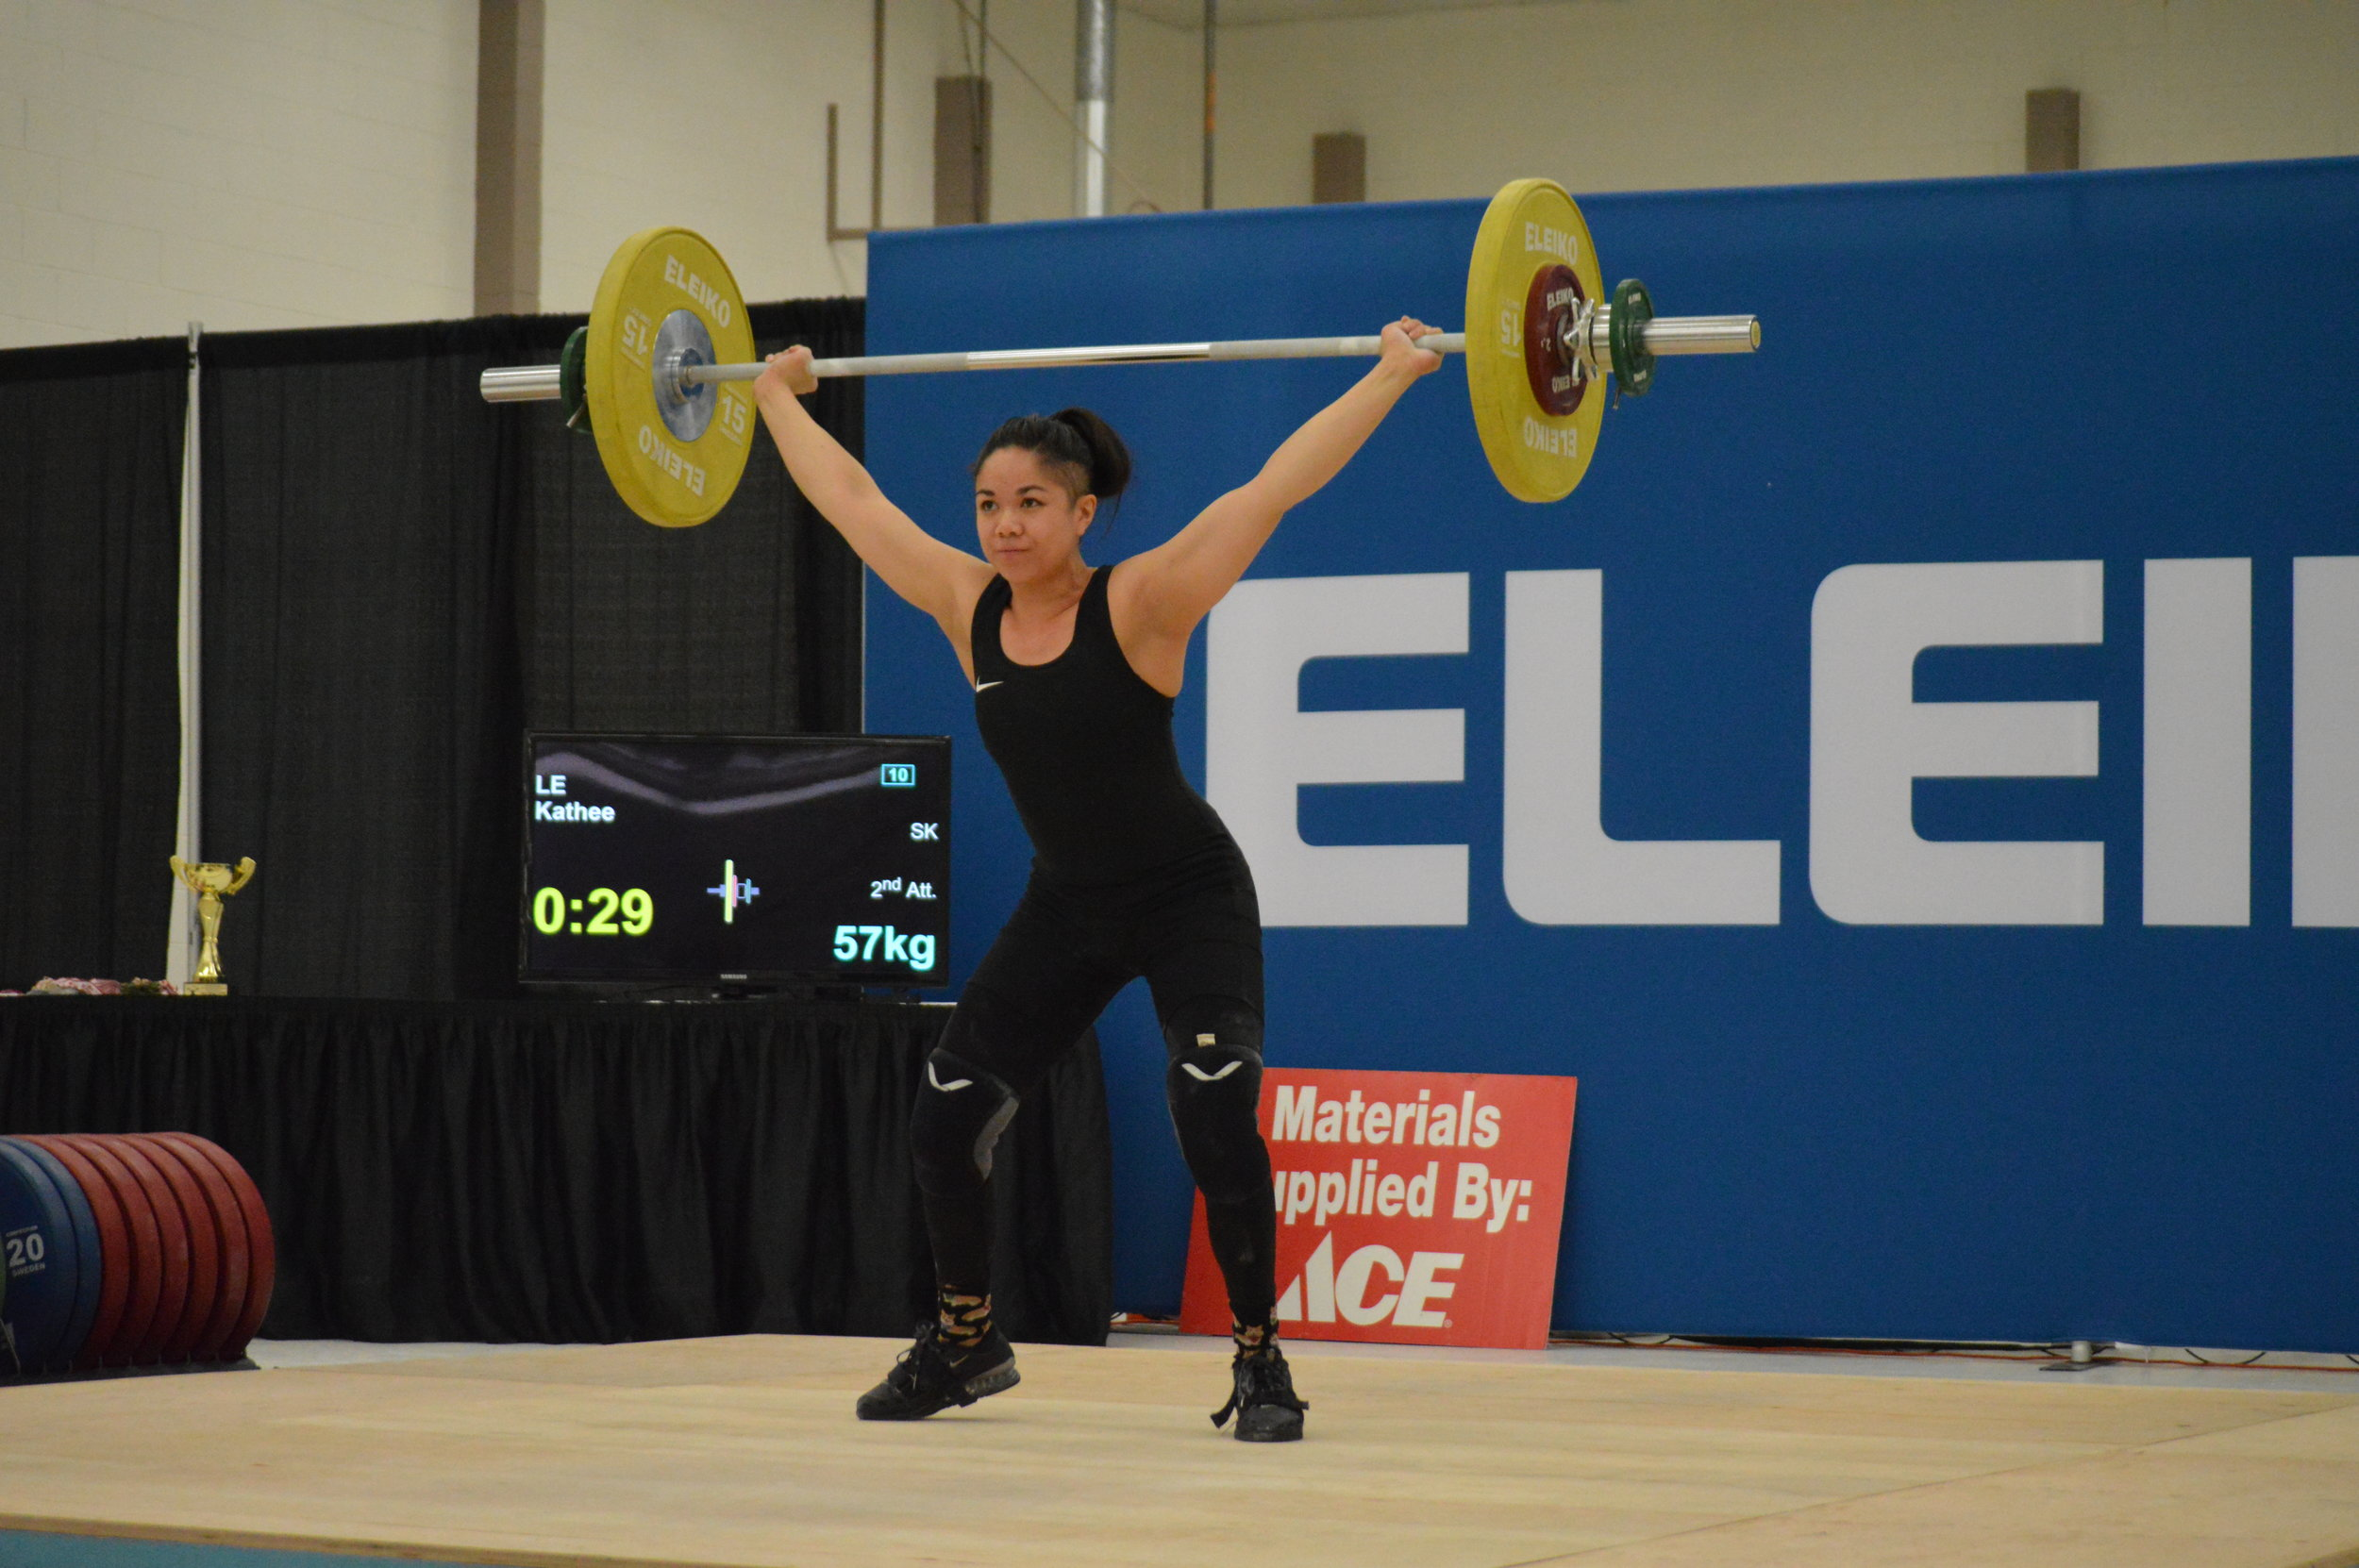 Kathee - snatch 57kg (4).JPG